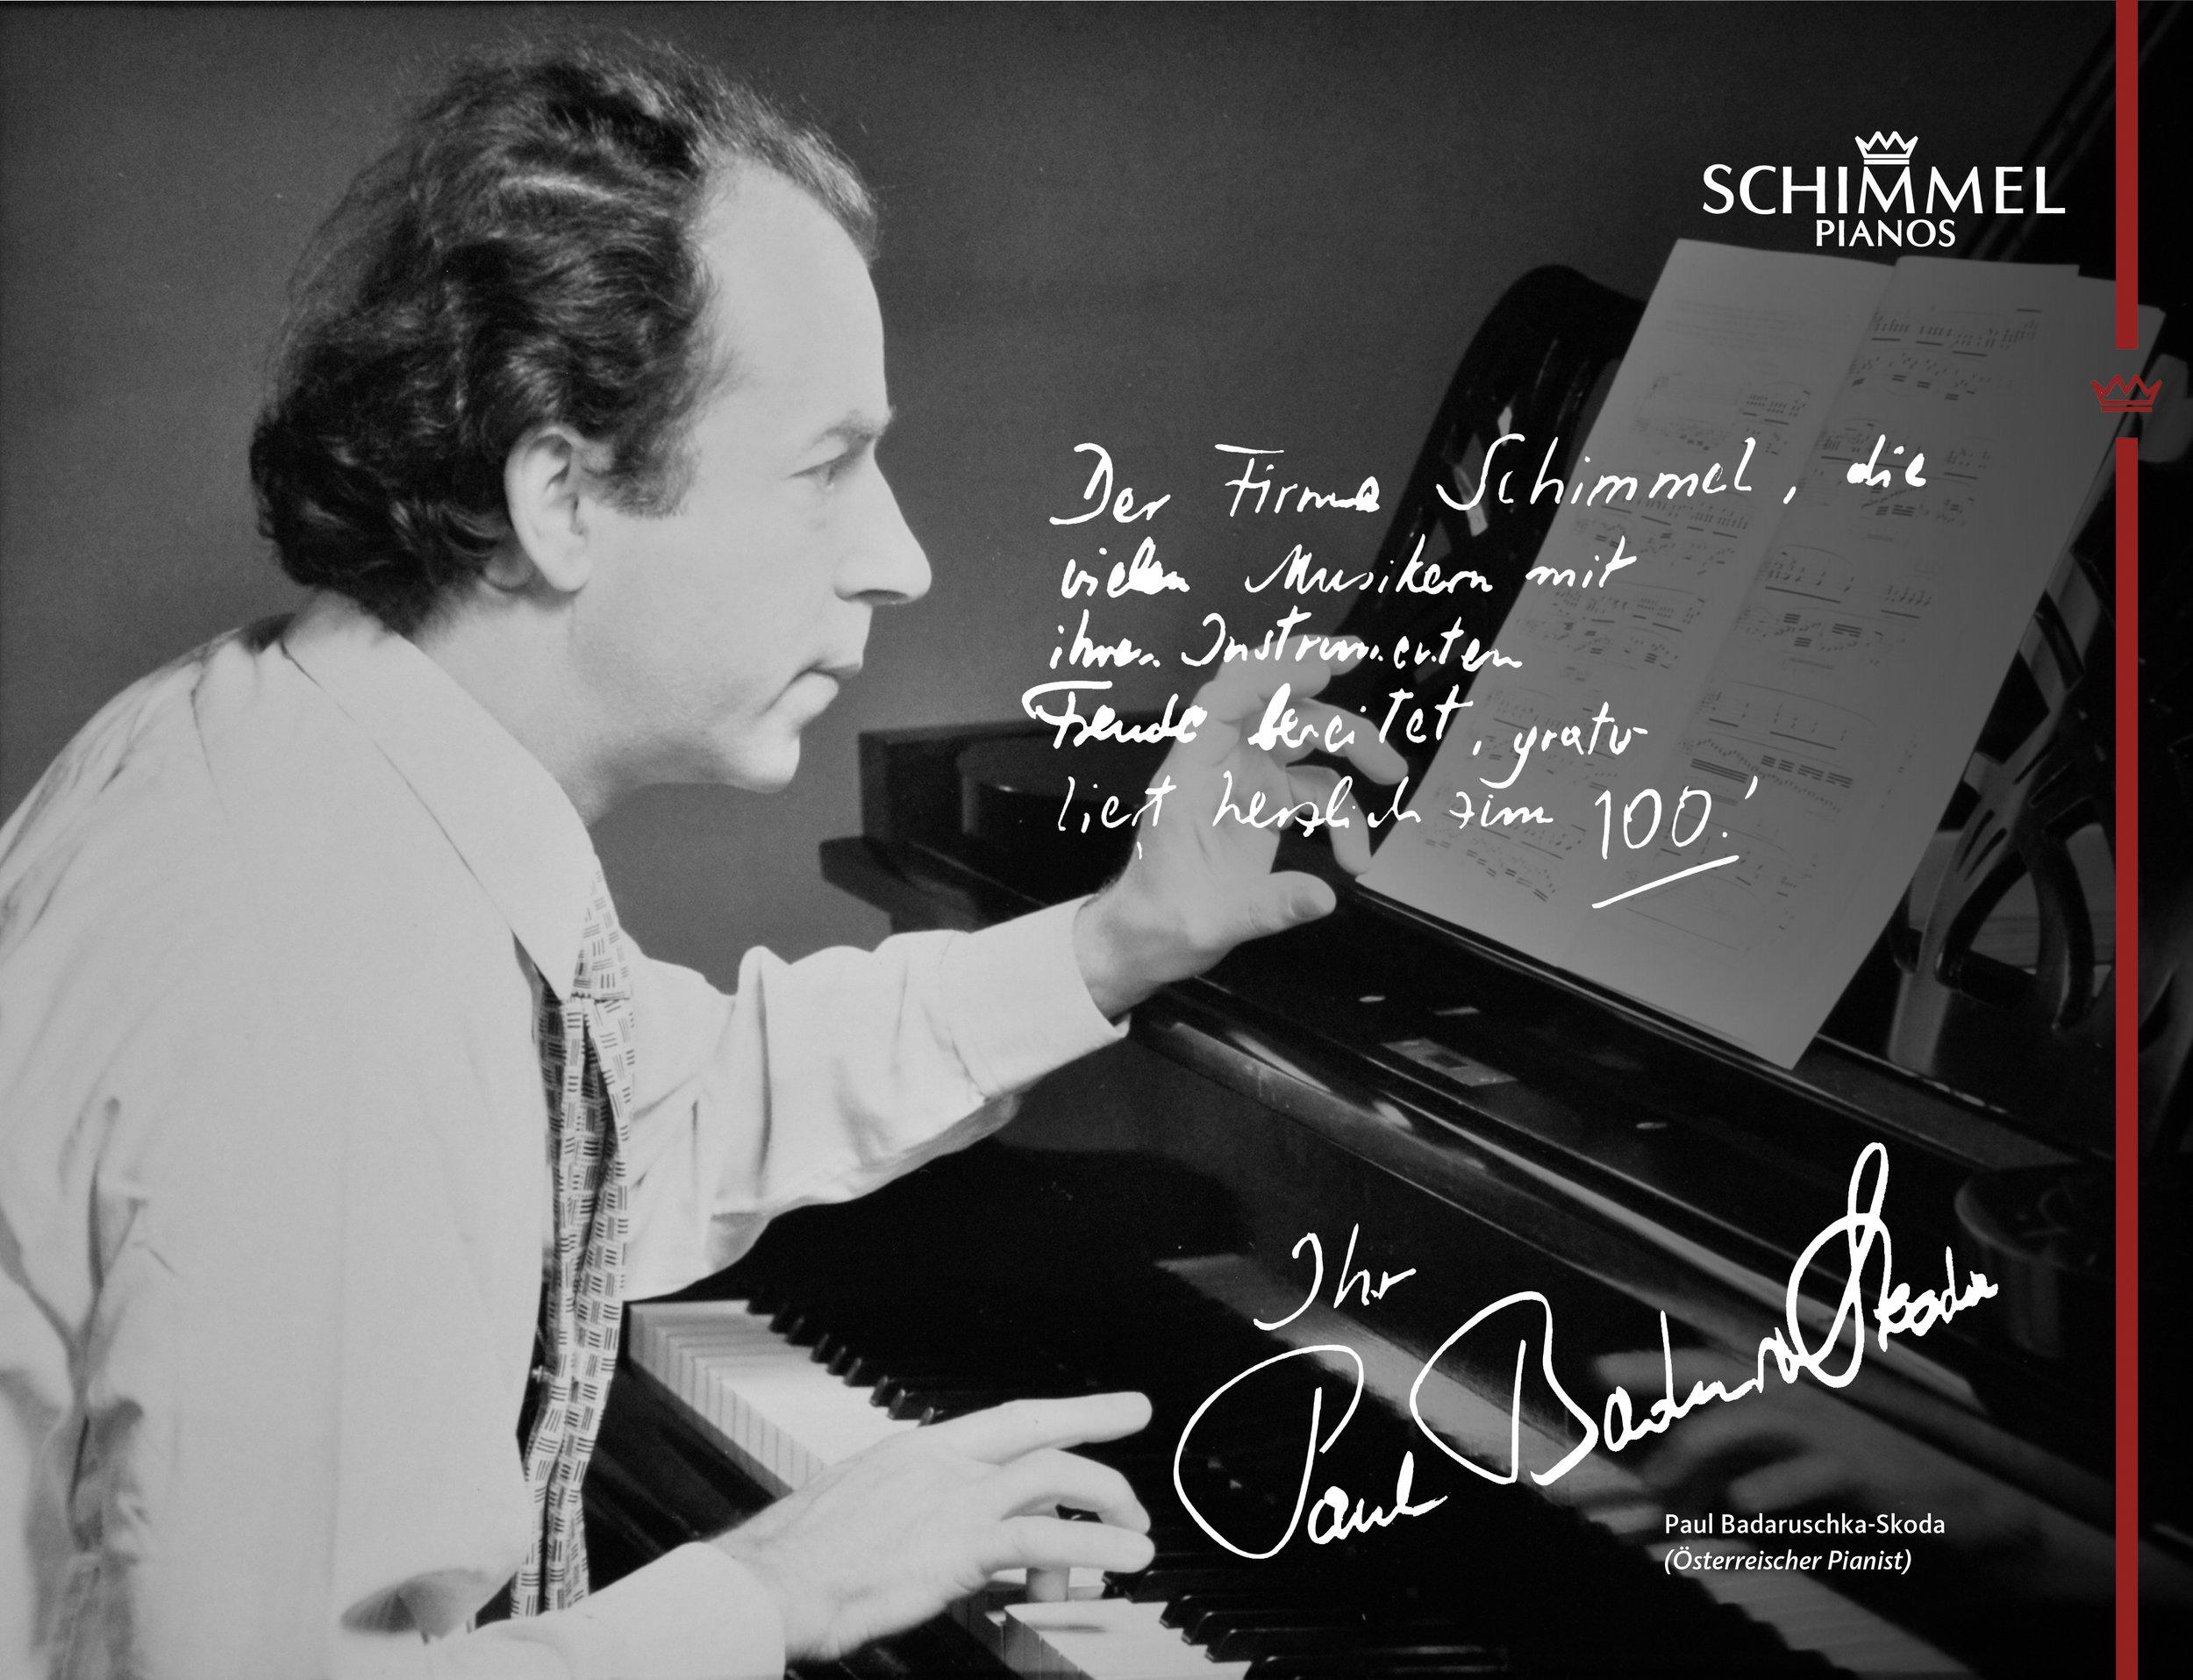 Paul Badaruschka-Skoda Schimmel Pianos